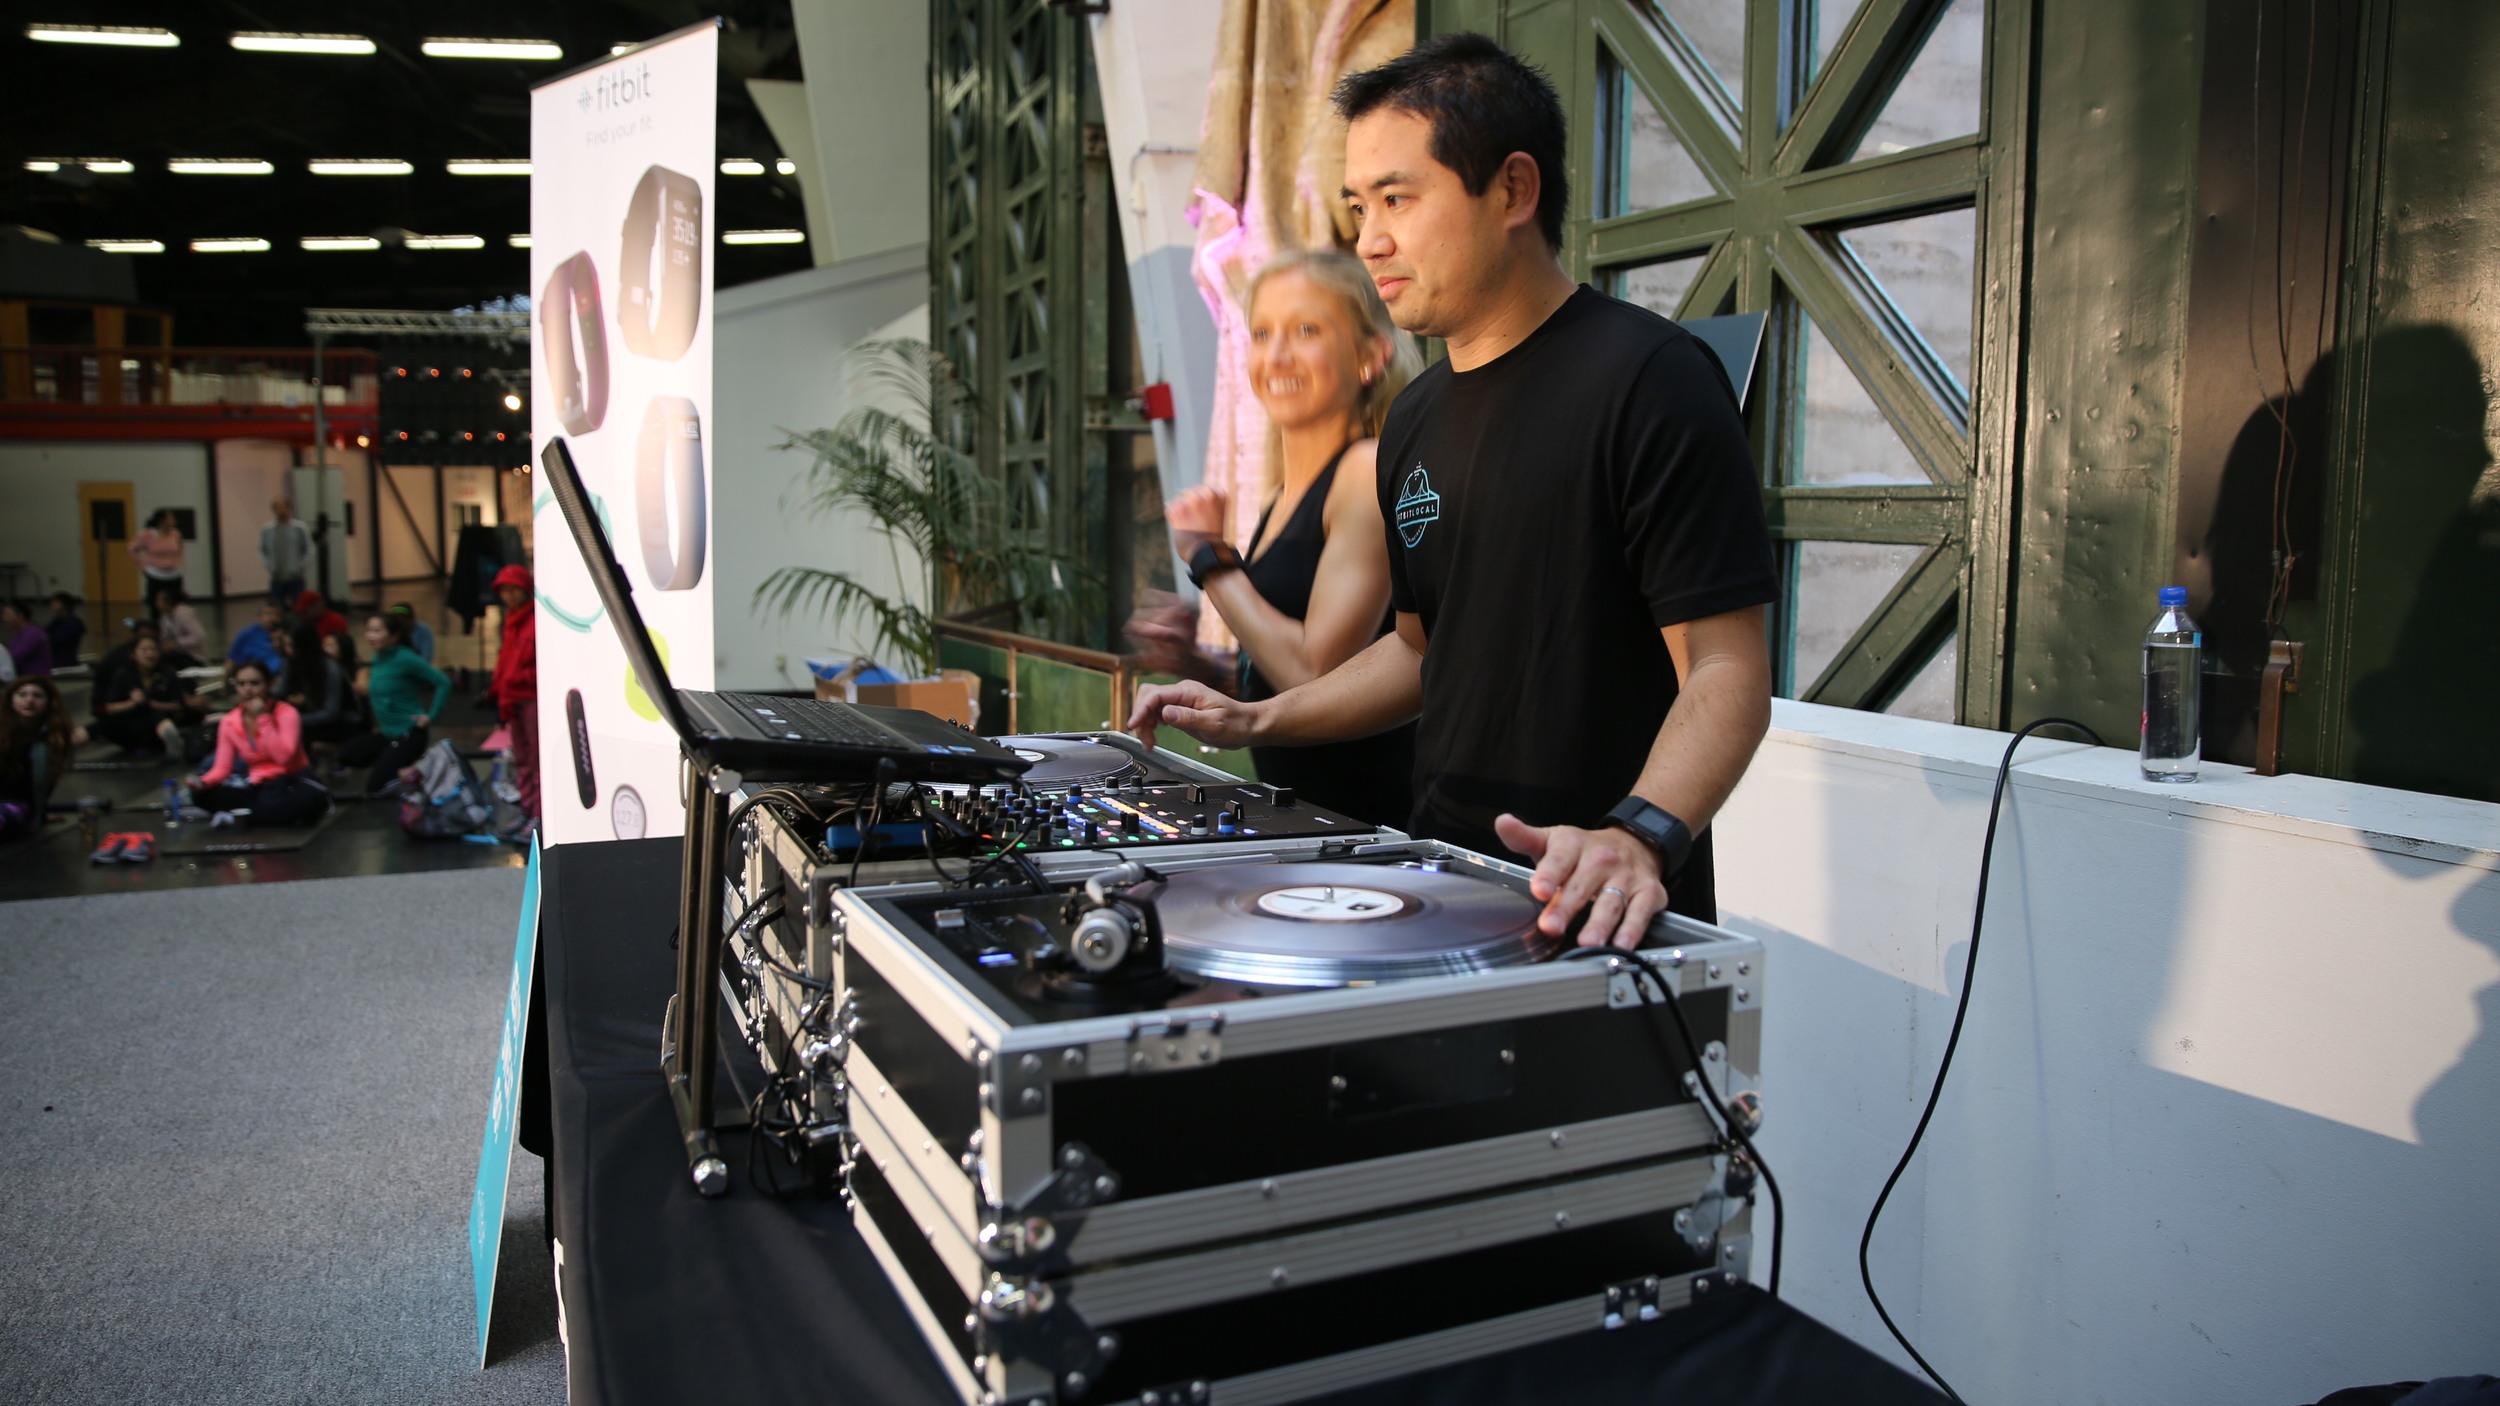 San   Diego based   DJ, Justin Kanoya, at the Fitbit Local kick off.